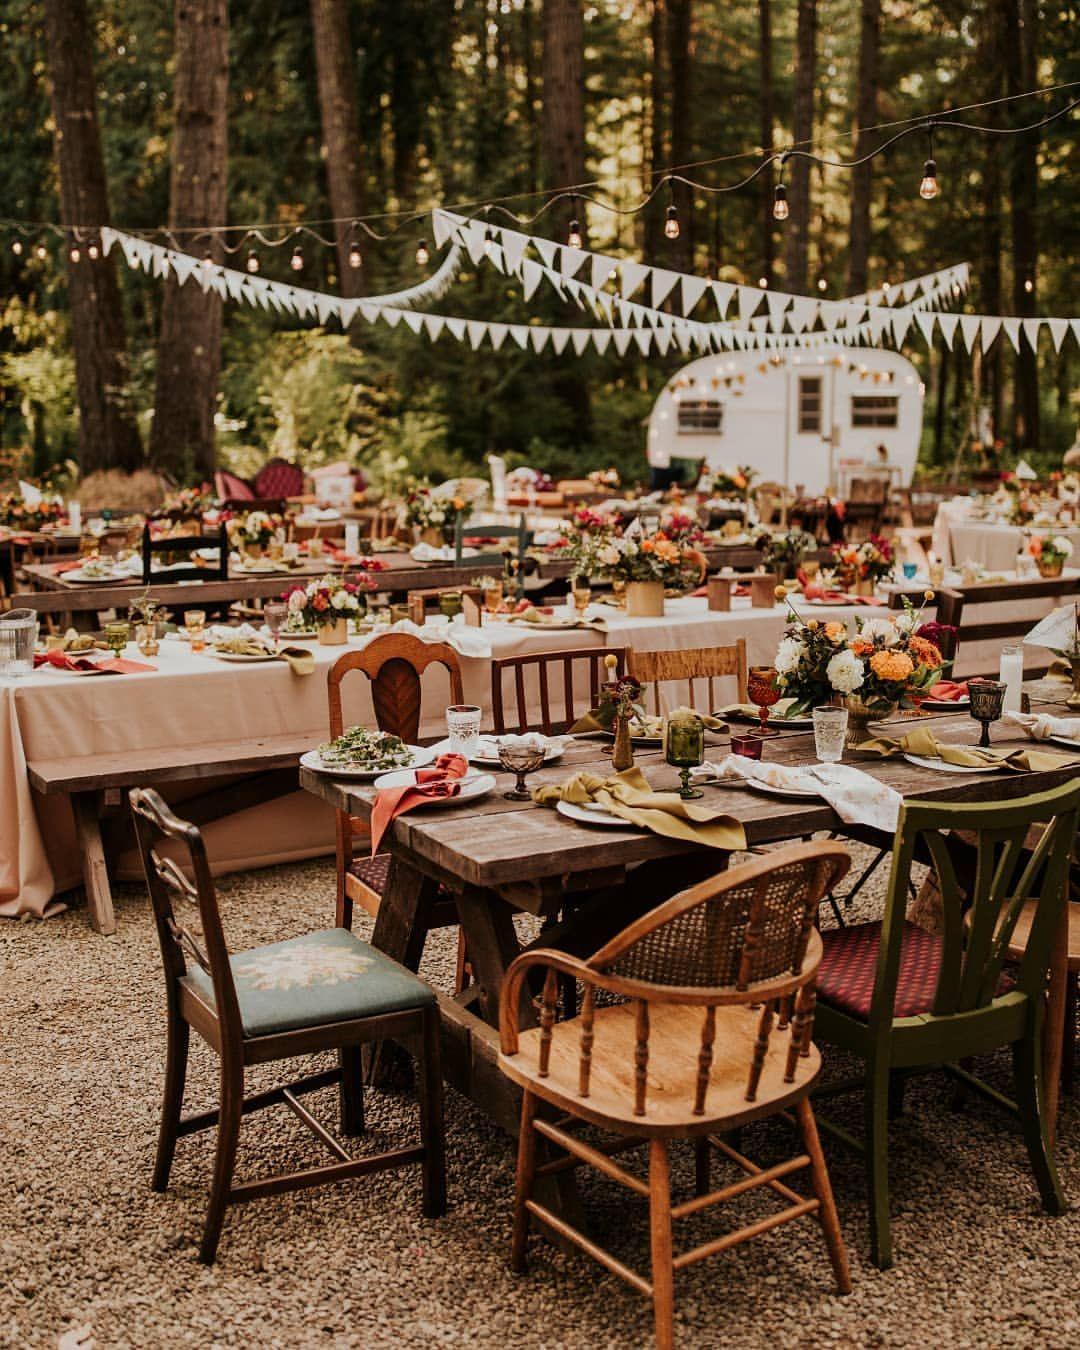 Mottagning Bröllop